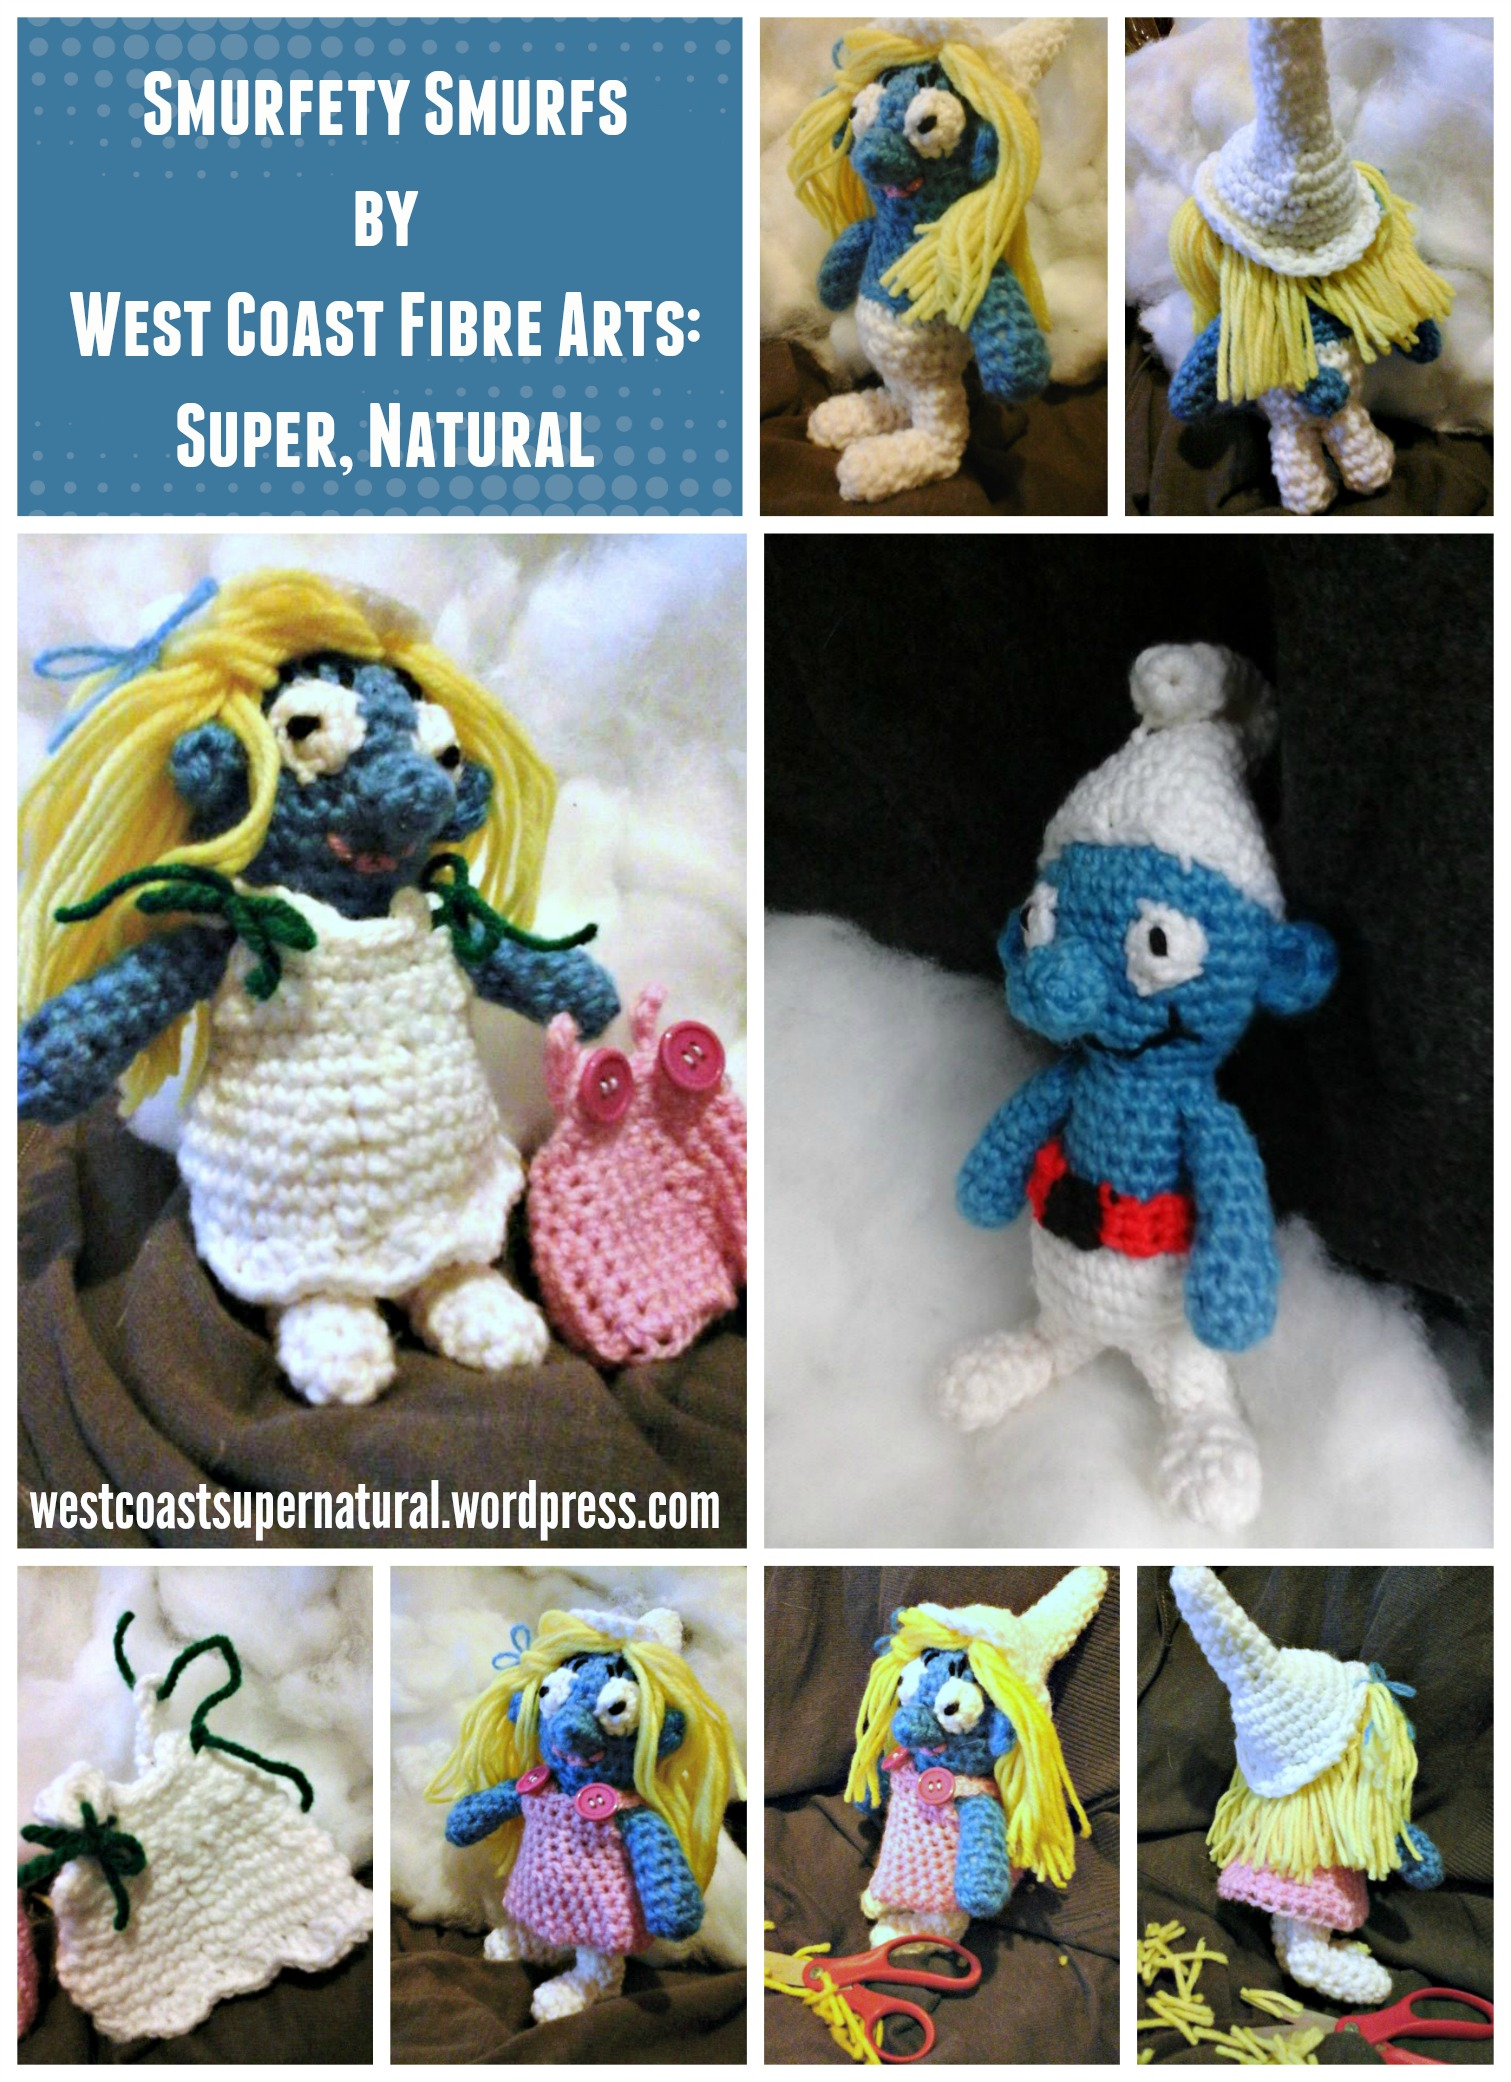 Smurf Smurfety Smurfette! | West Coast Fibre Arts: Super, Natural